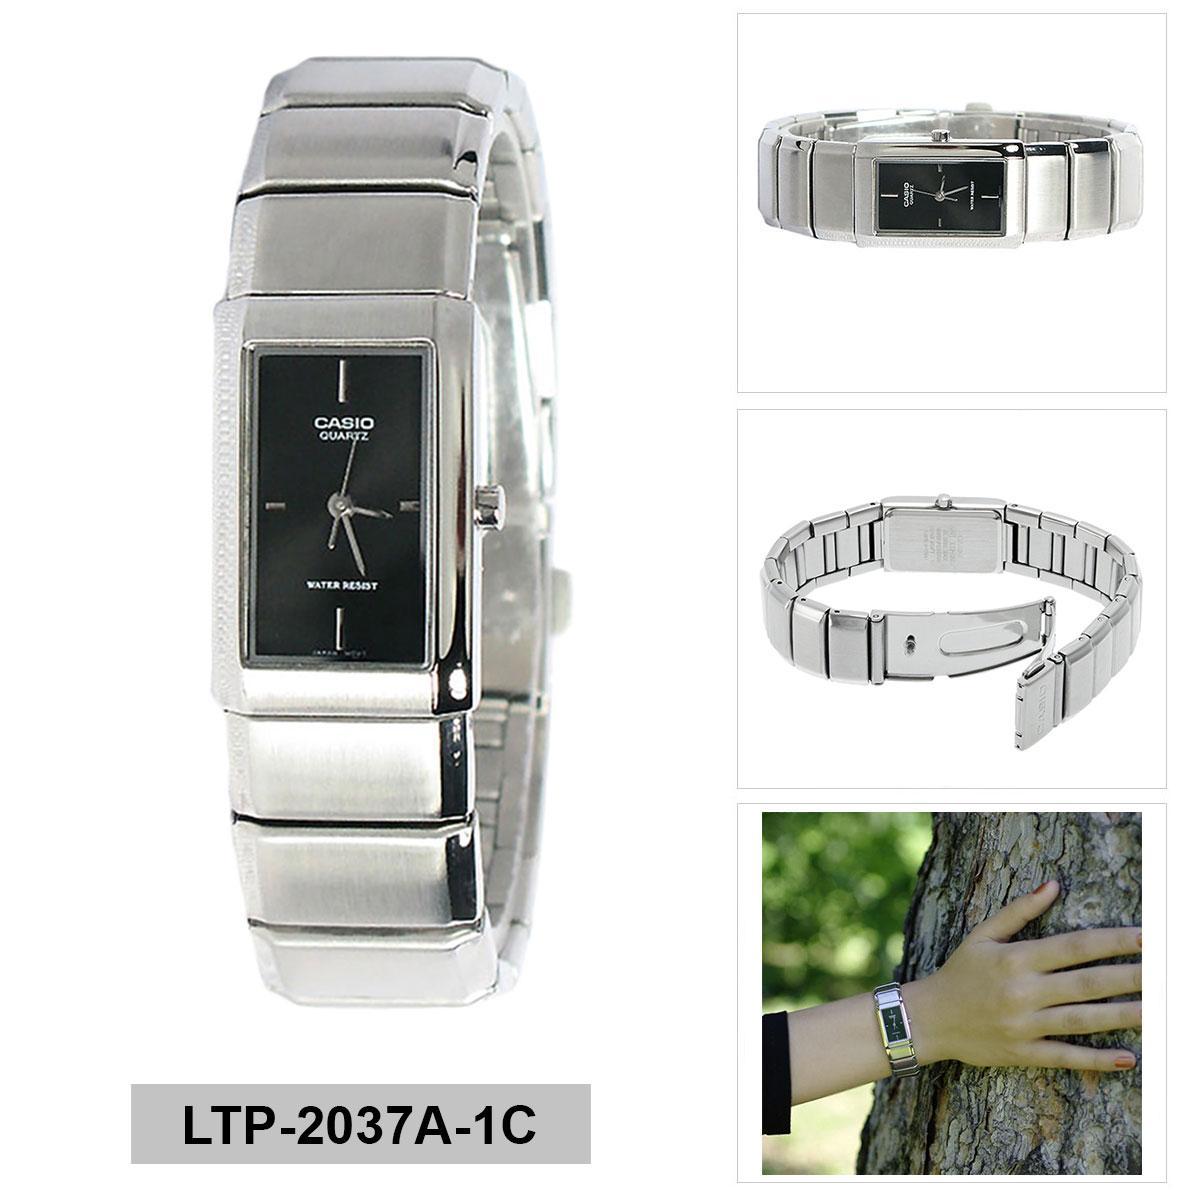 Casio Analog Ltp 2037a 1c Womens Watch Silverblack Daftar Harga 1230d 7cdf Jam Tangan Wanita Silver